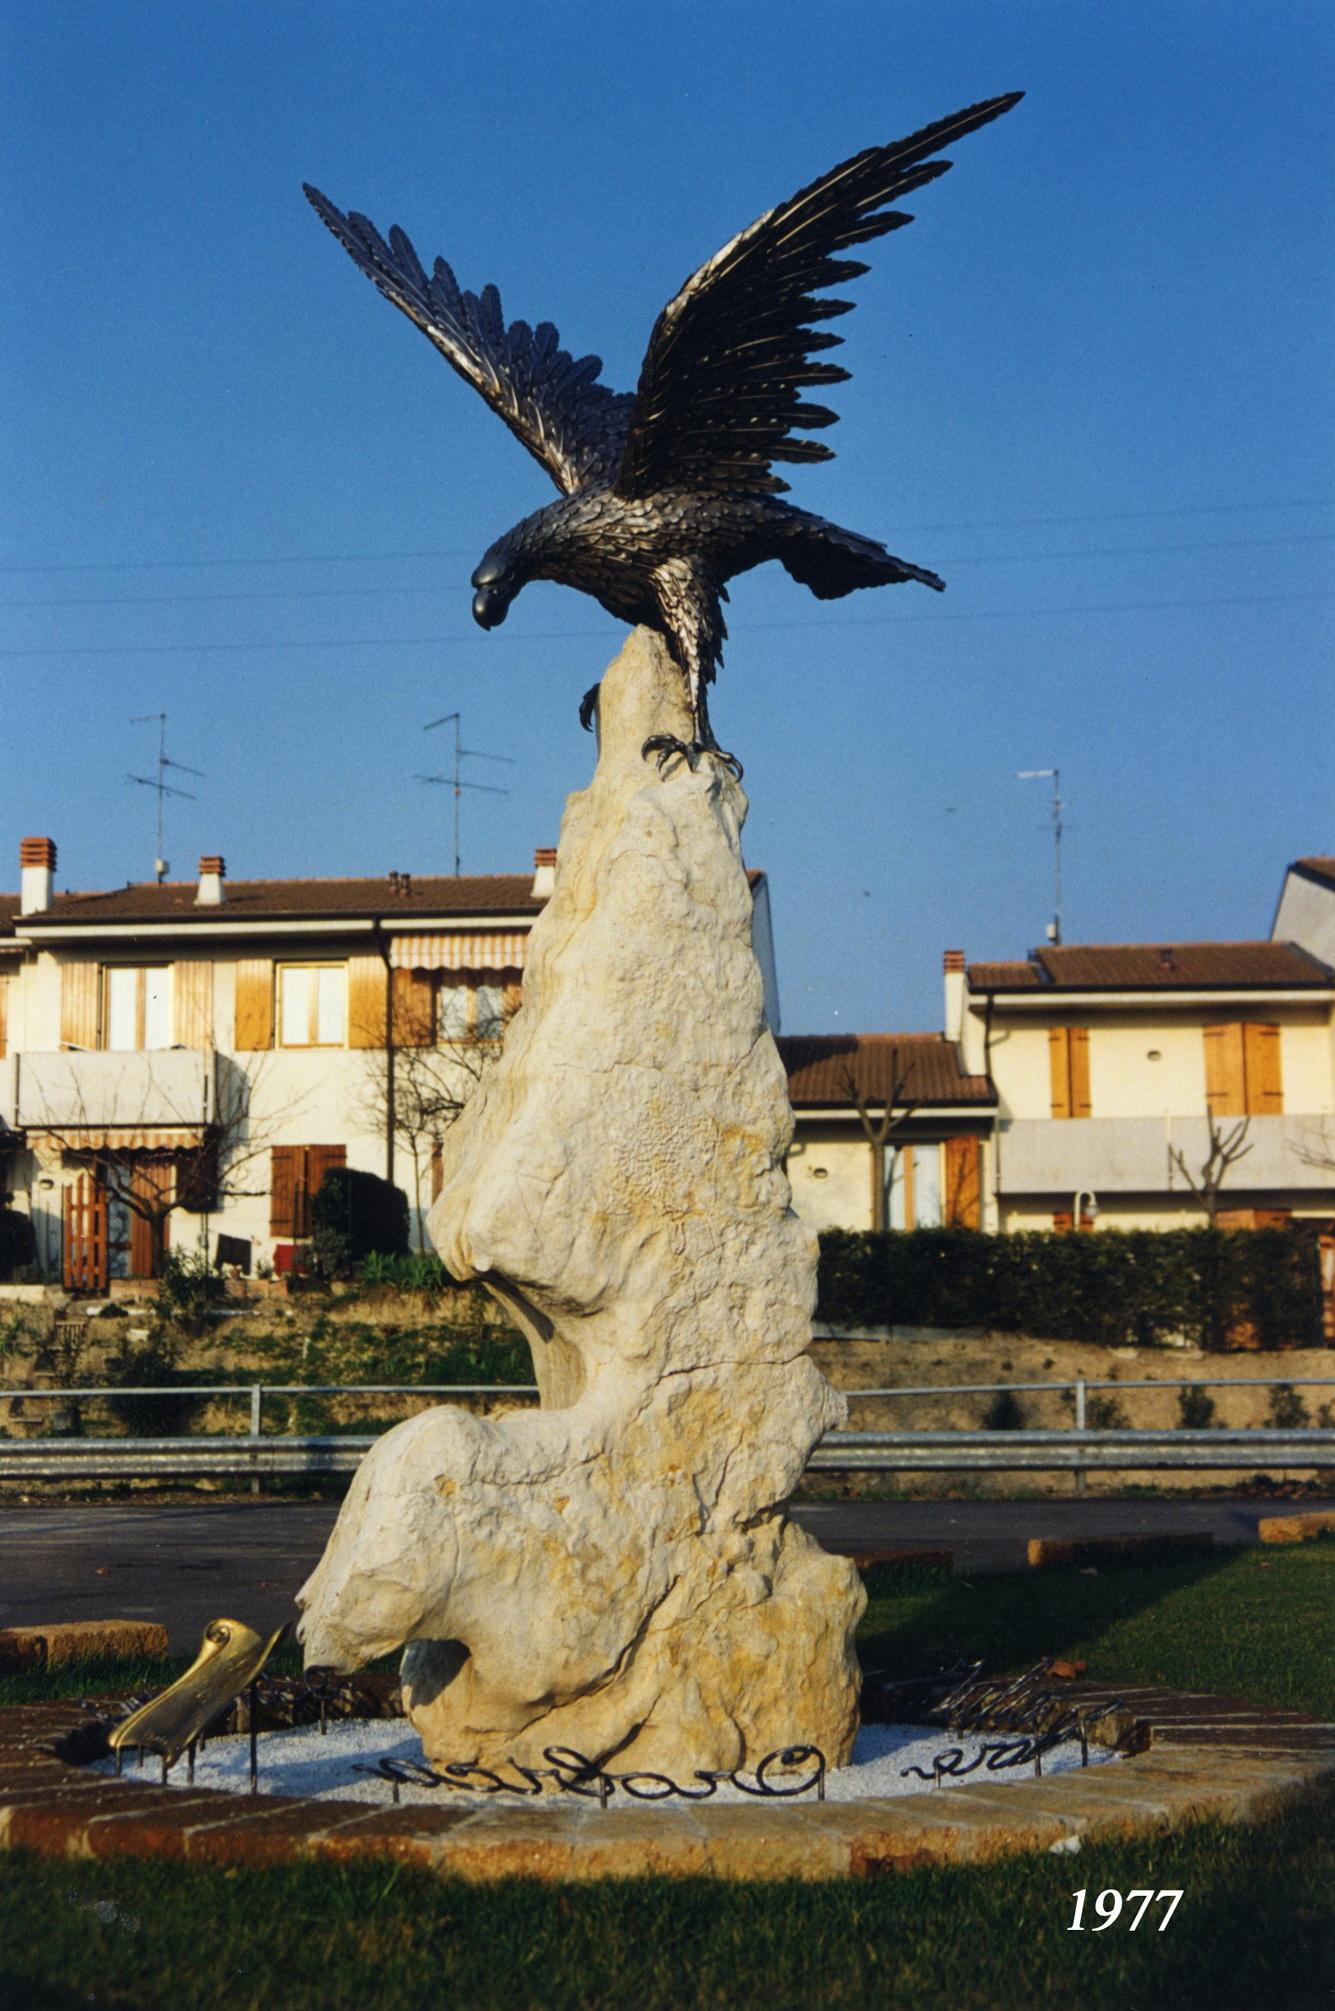 1997 - Bovolone (VR)